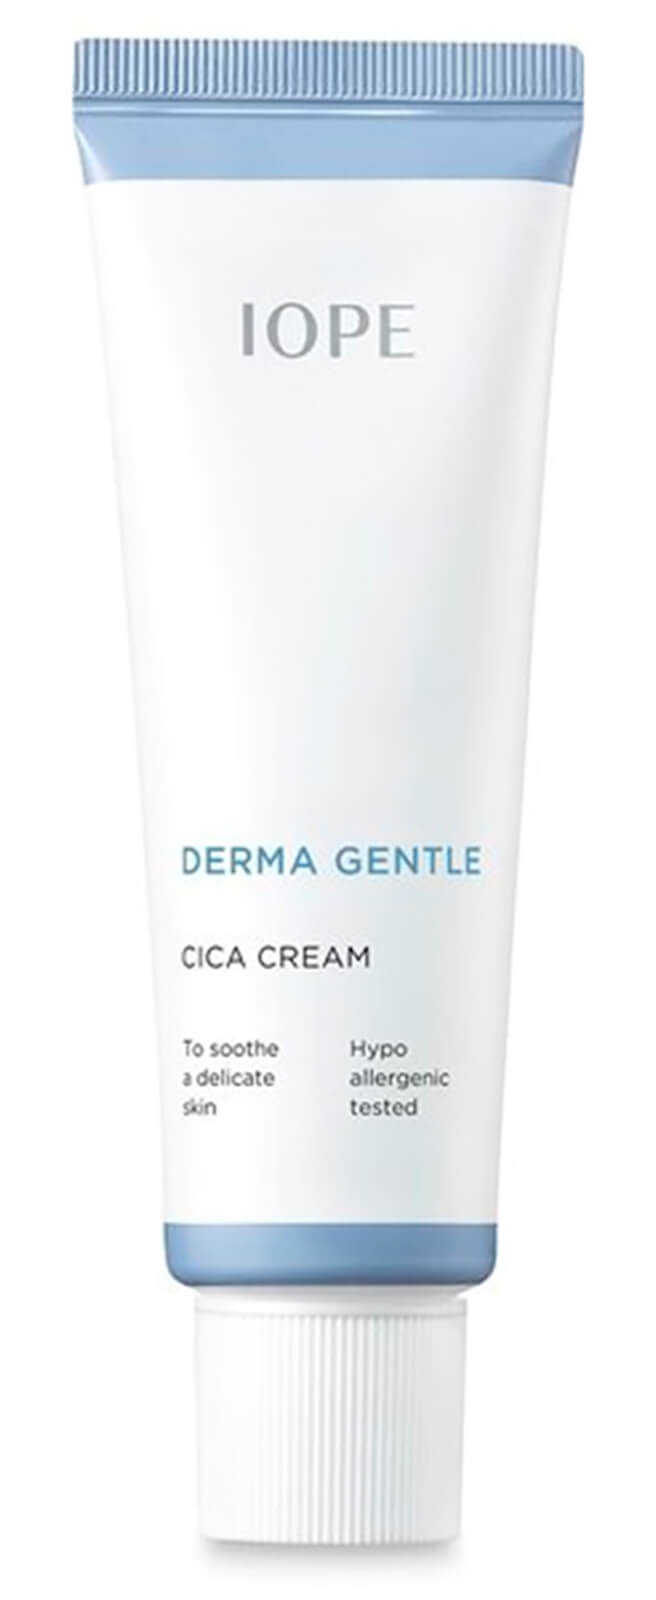 IOPE Derma Gentle Cica Cream